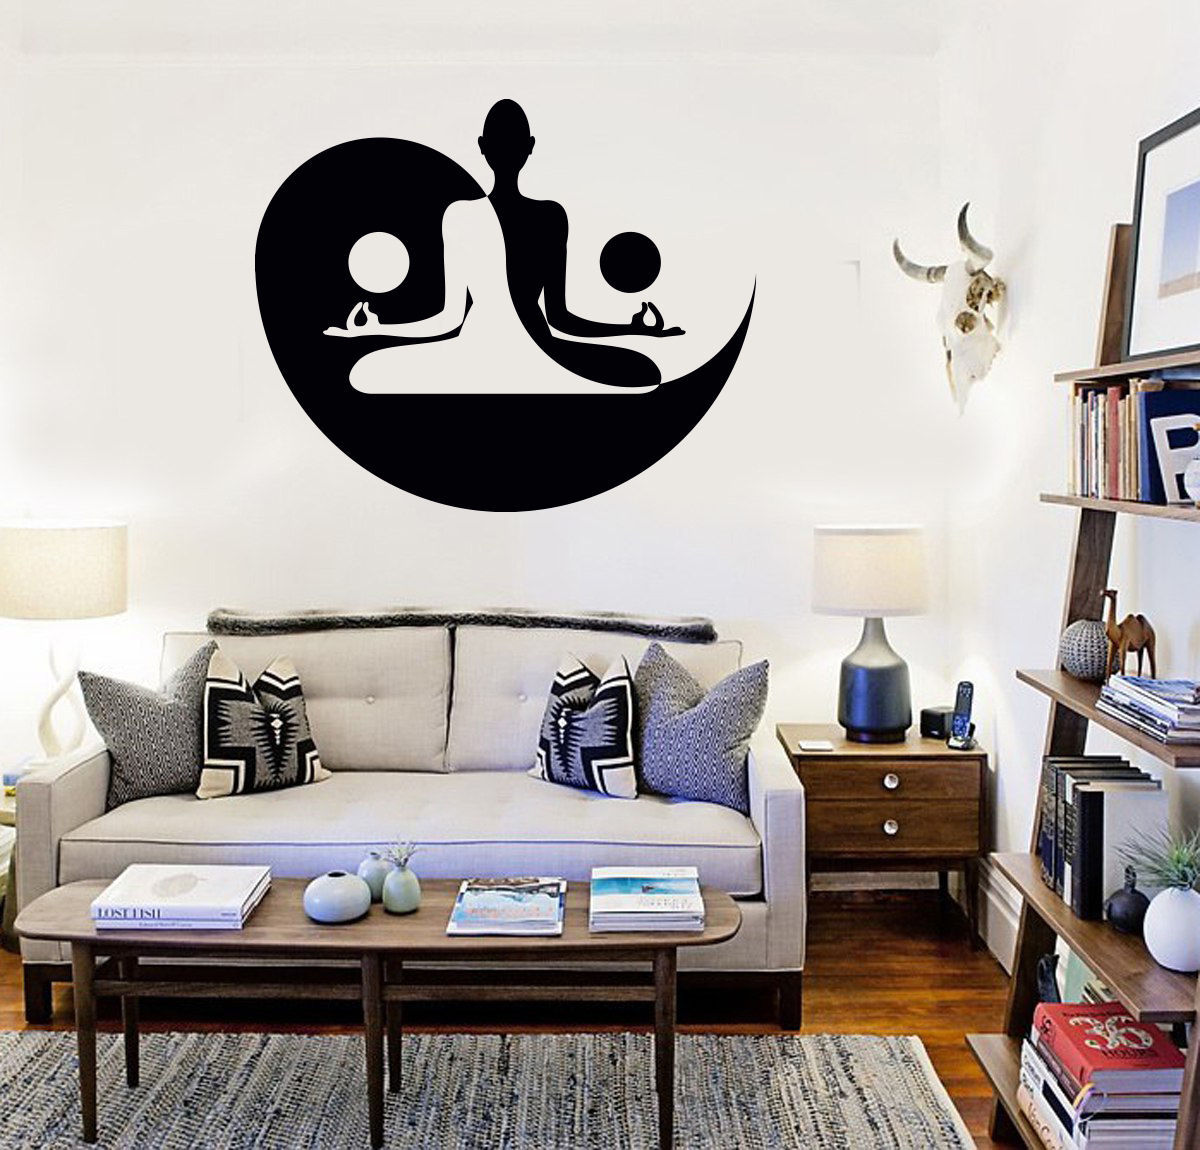 Vinyl decal yin yang yoga meditation bedroom decor wall for Meuble mural yin yang